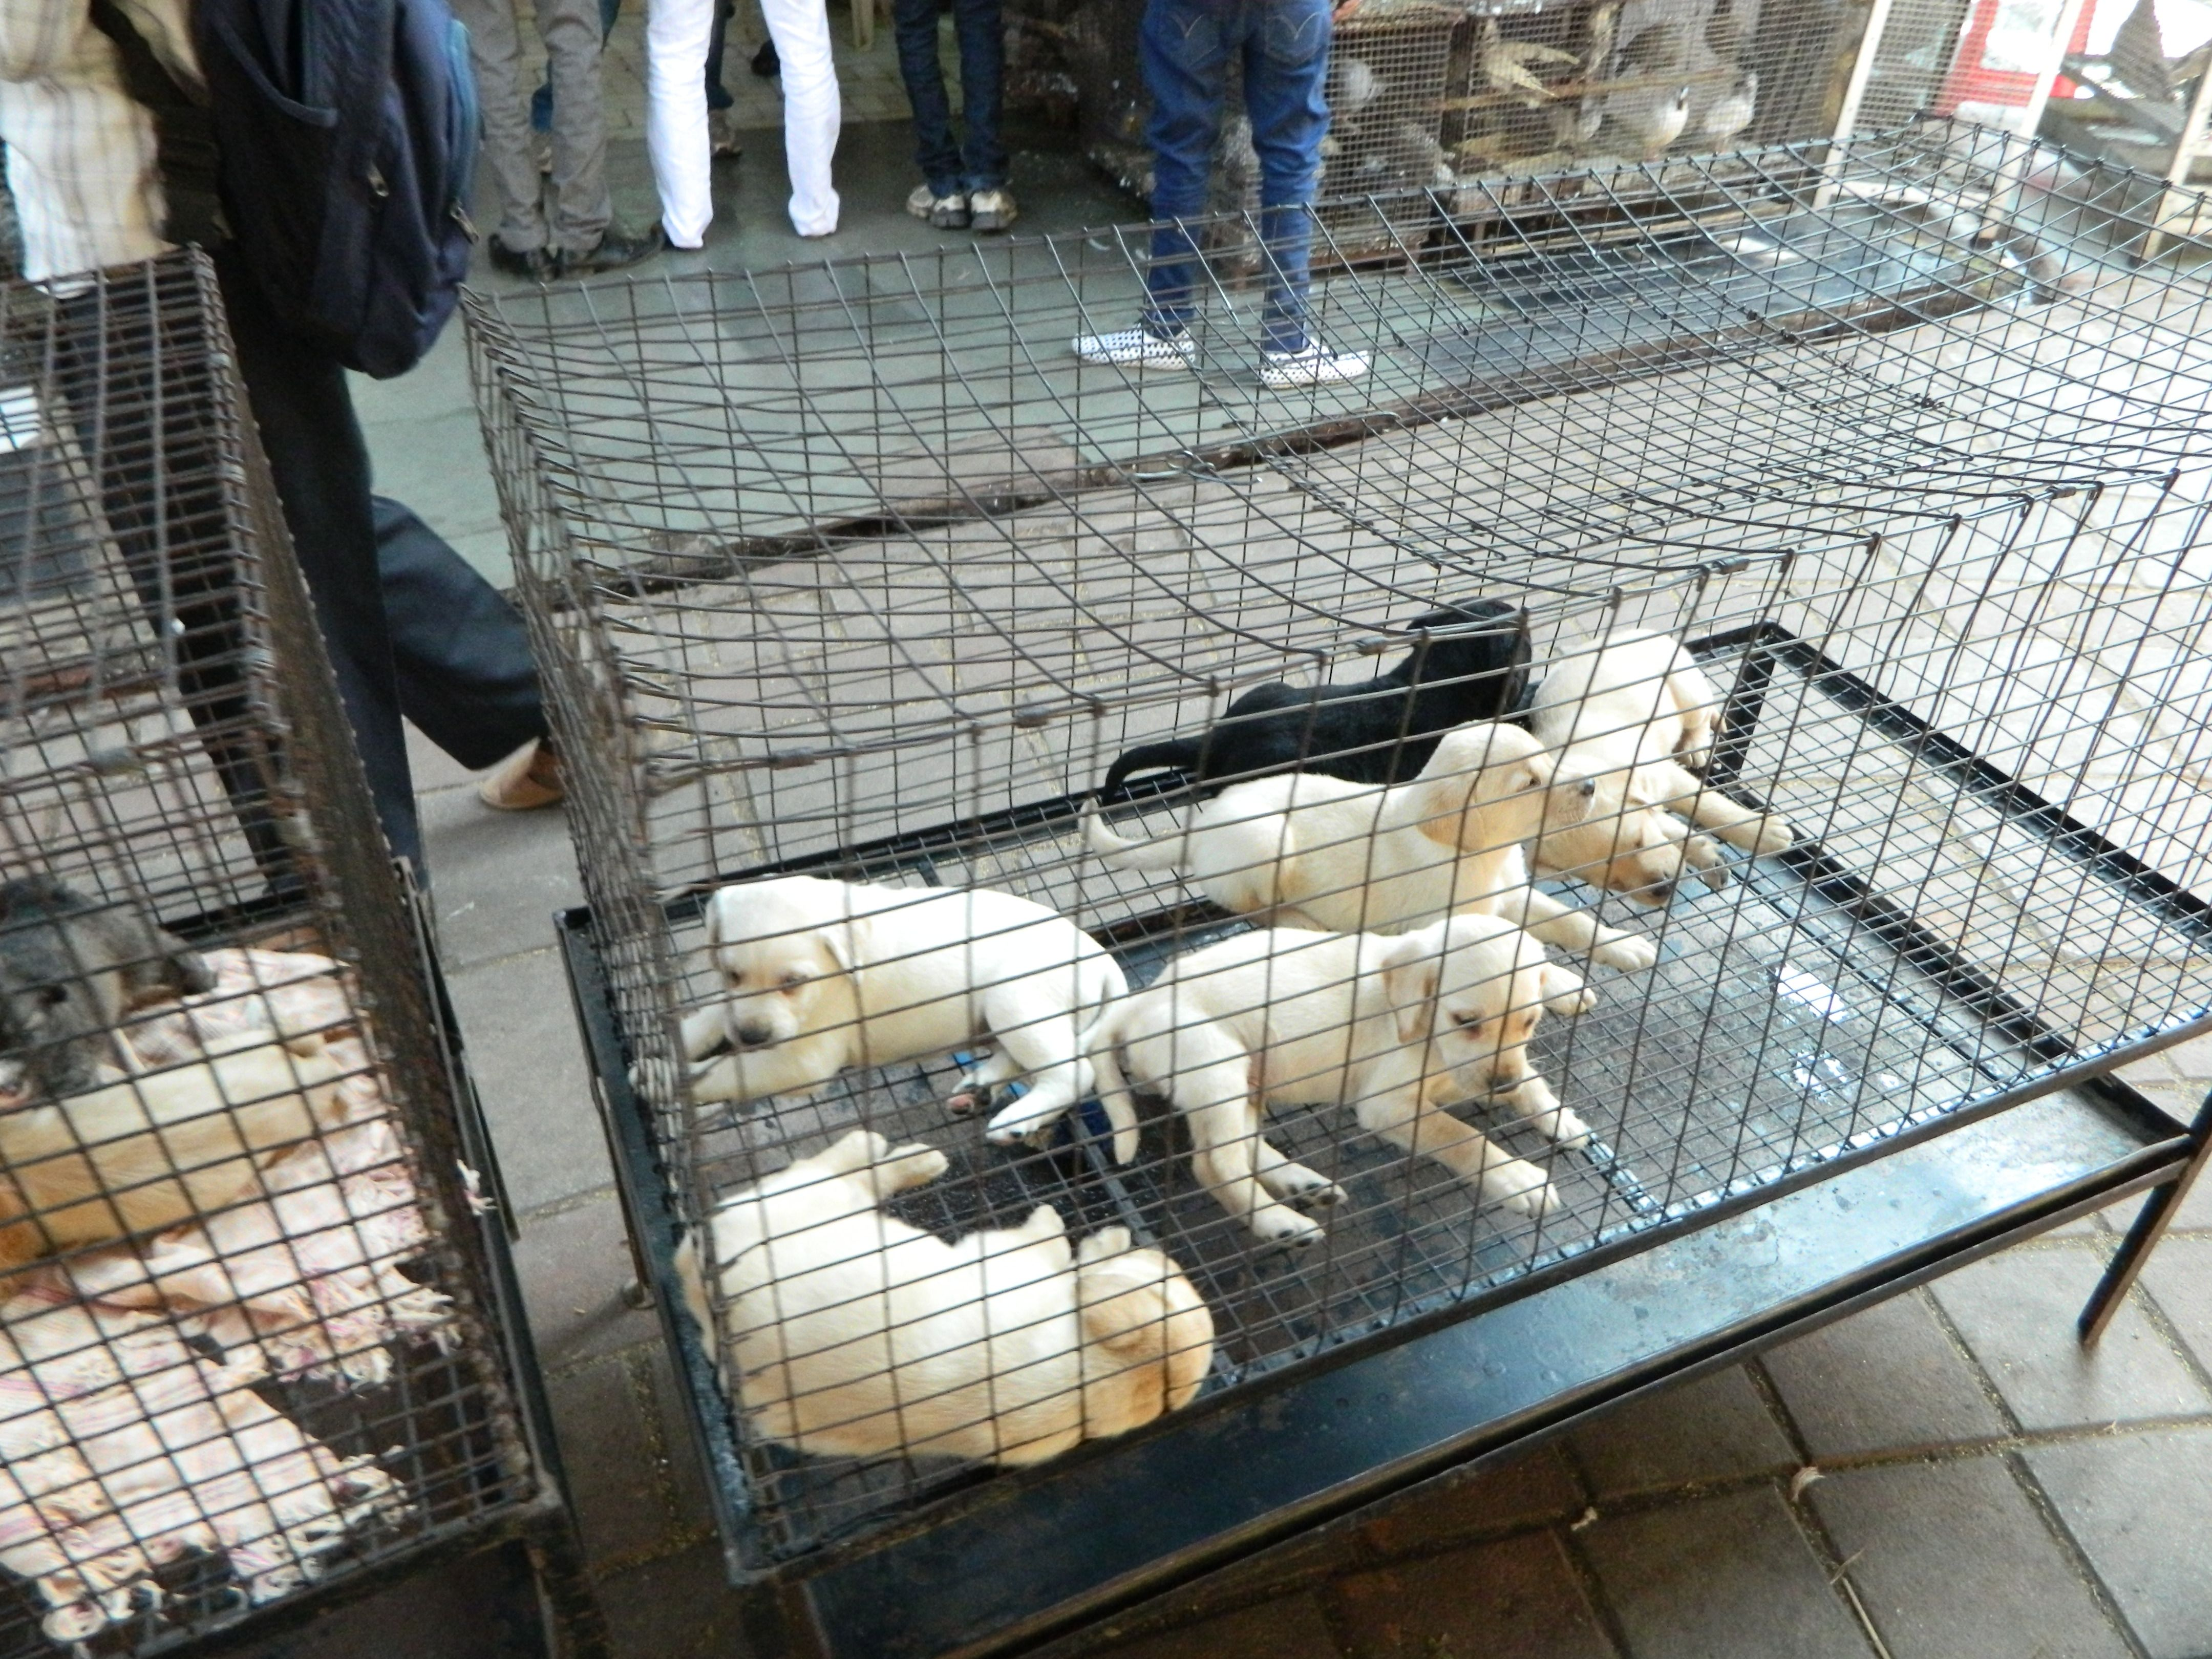 Pitbull Puppies For Sale California Craigslist Ideas